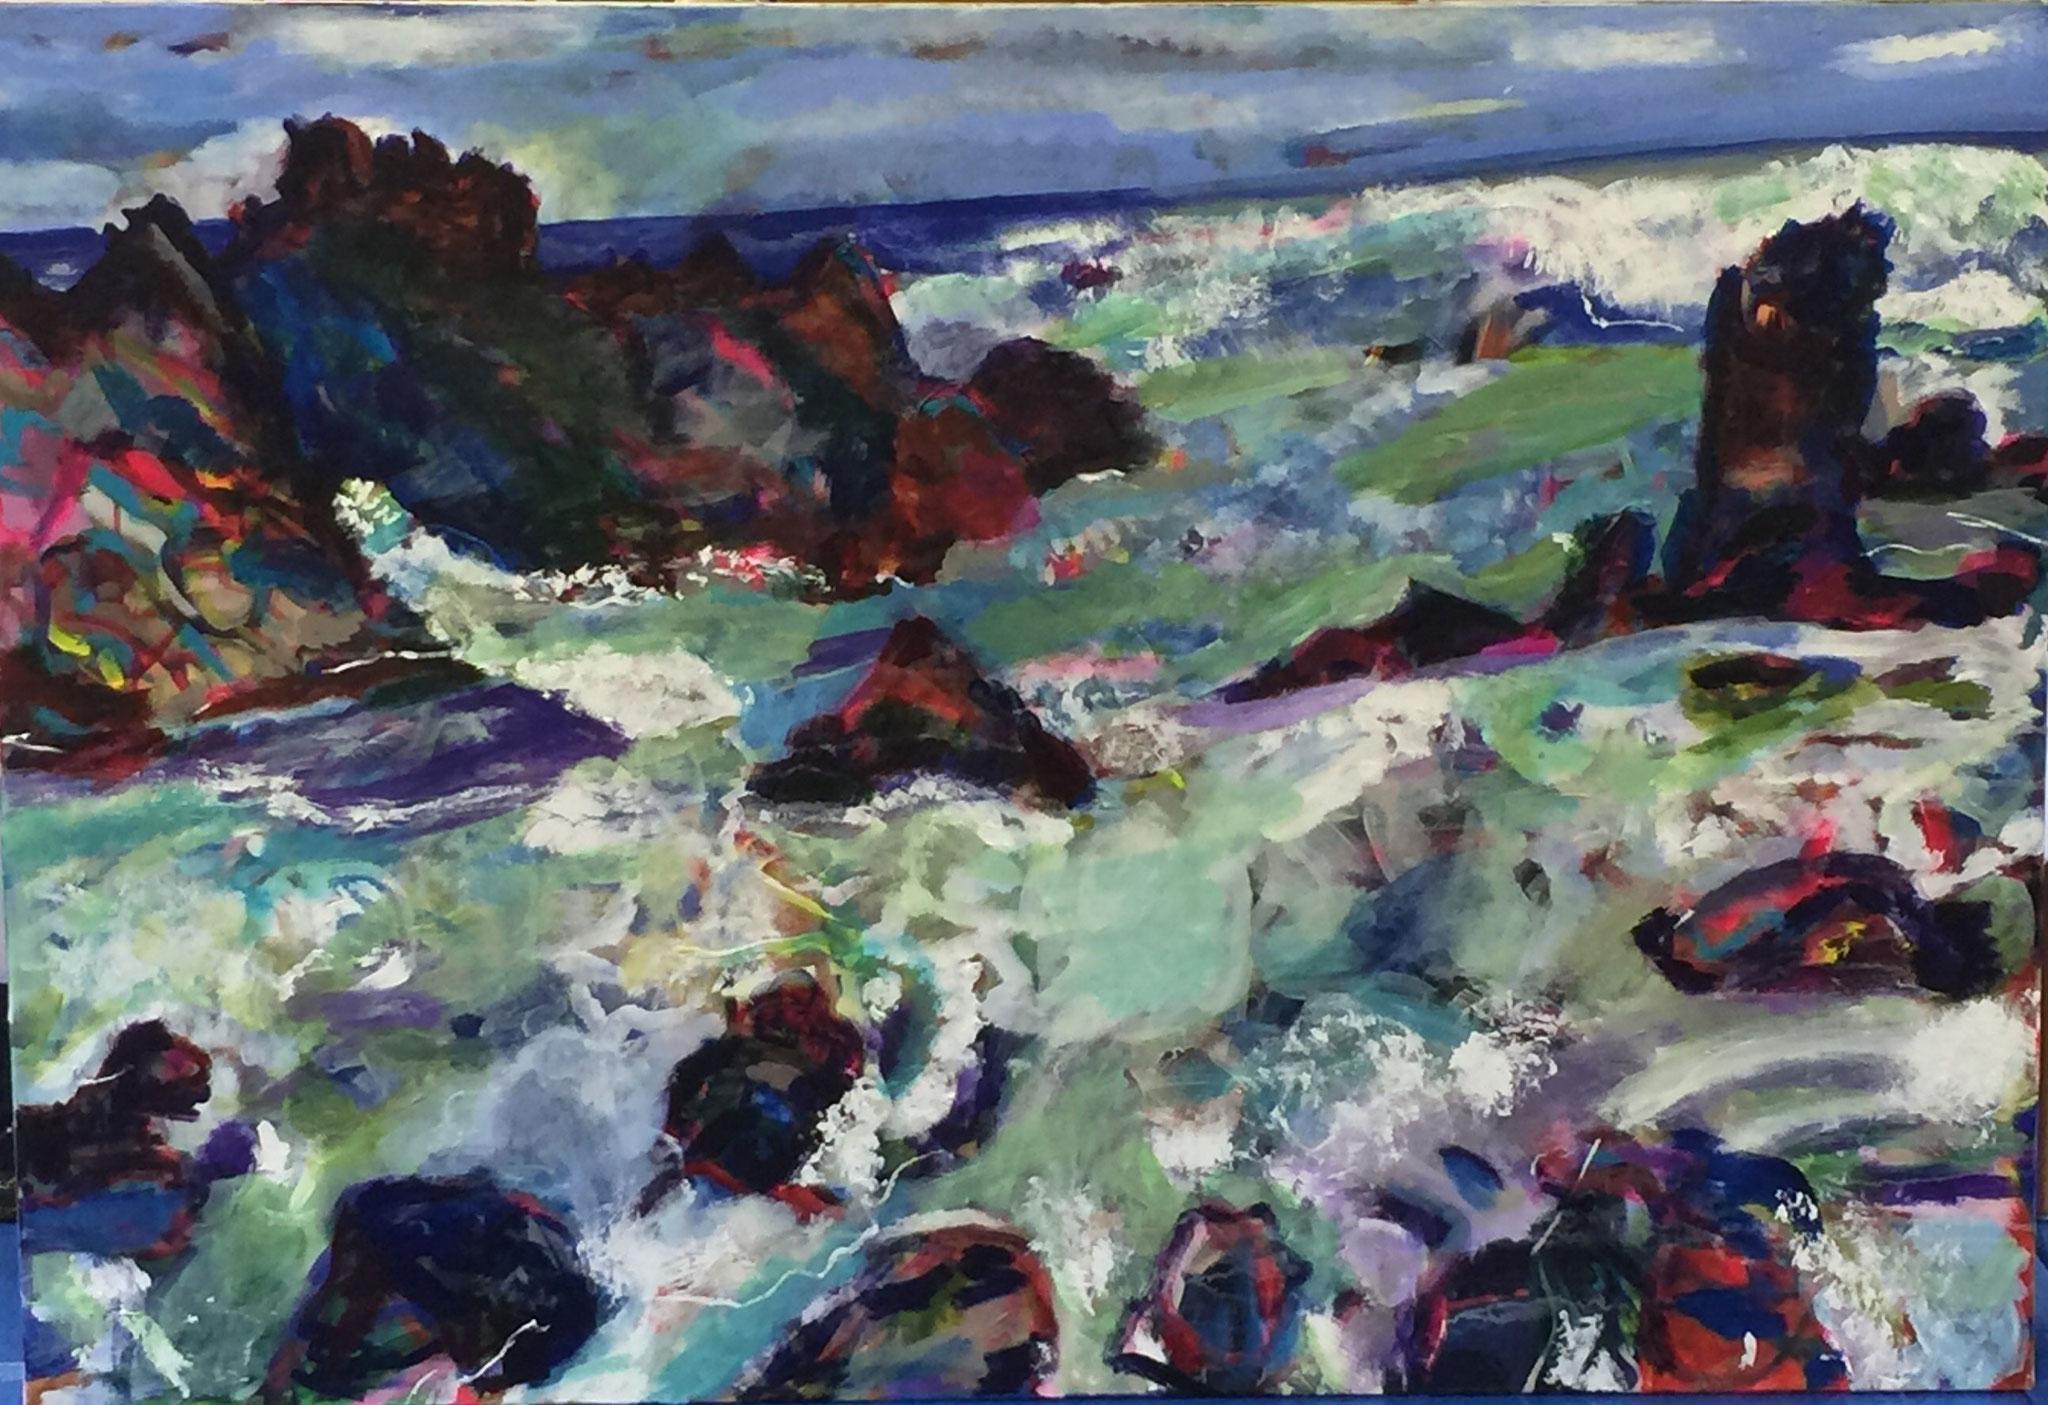 Wasser 4, 90x130  acrylic on canvas